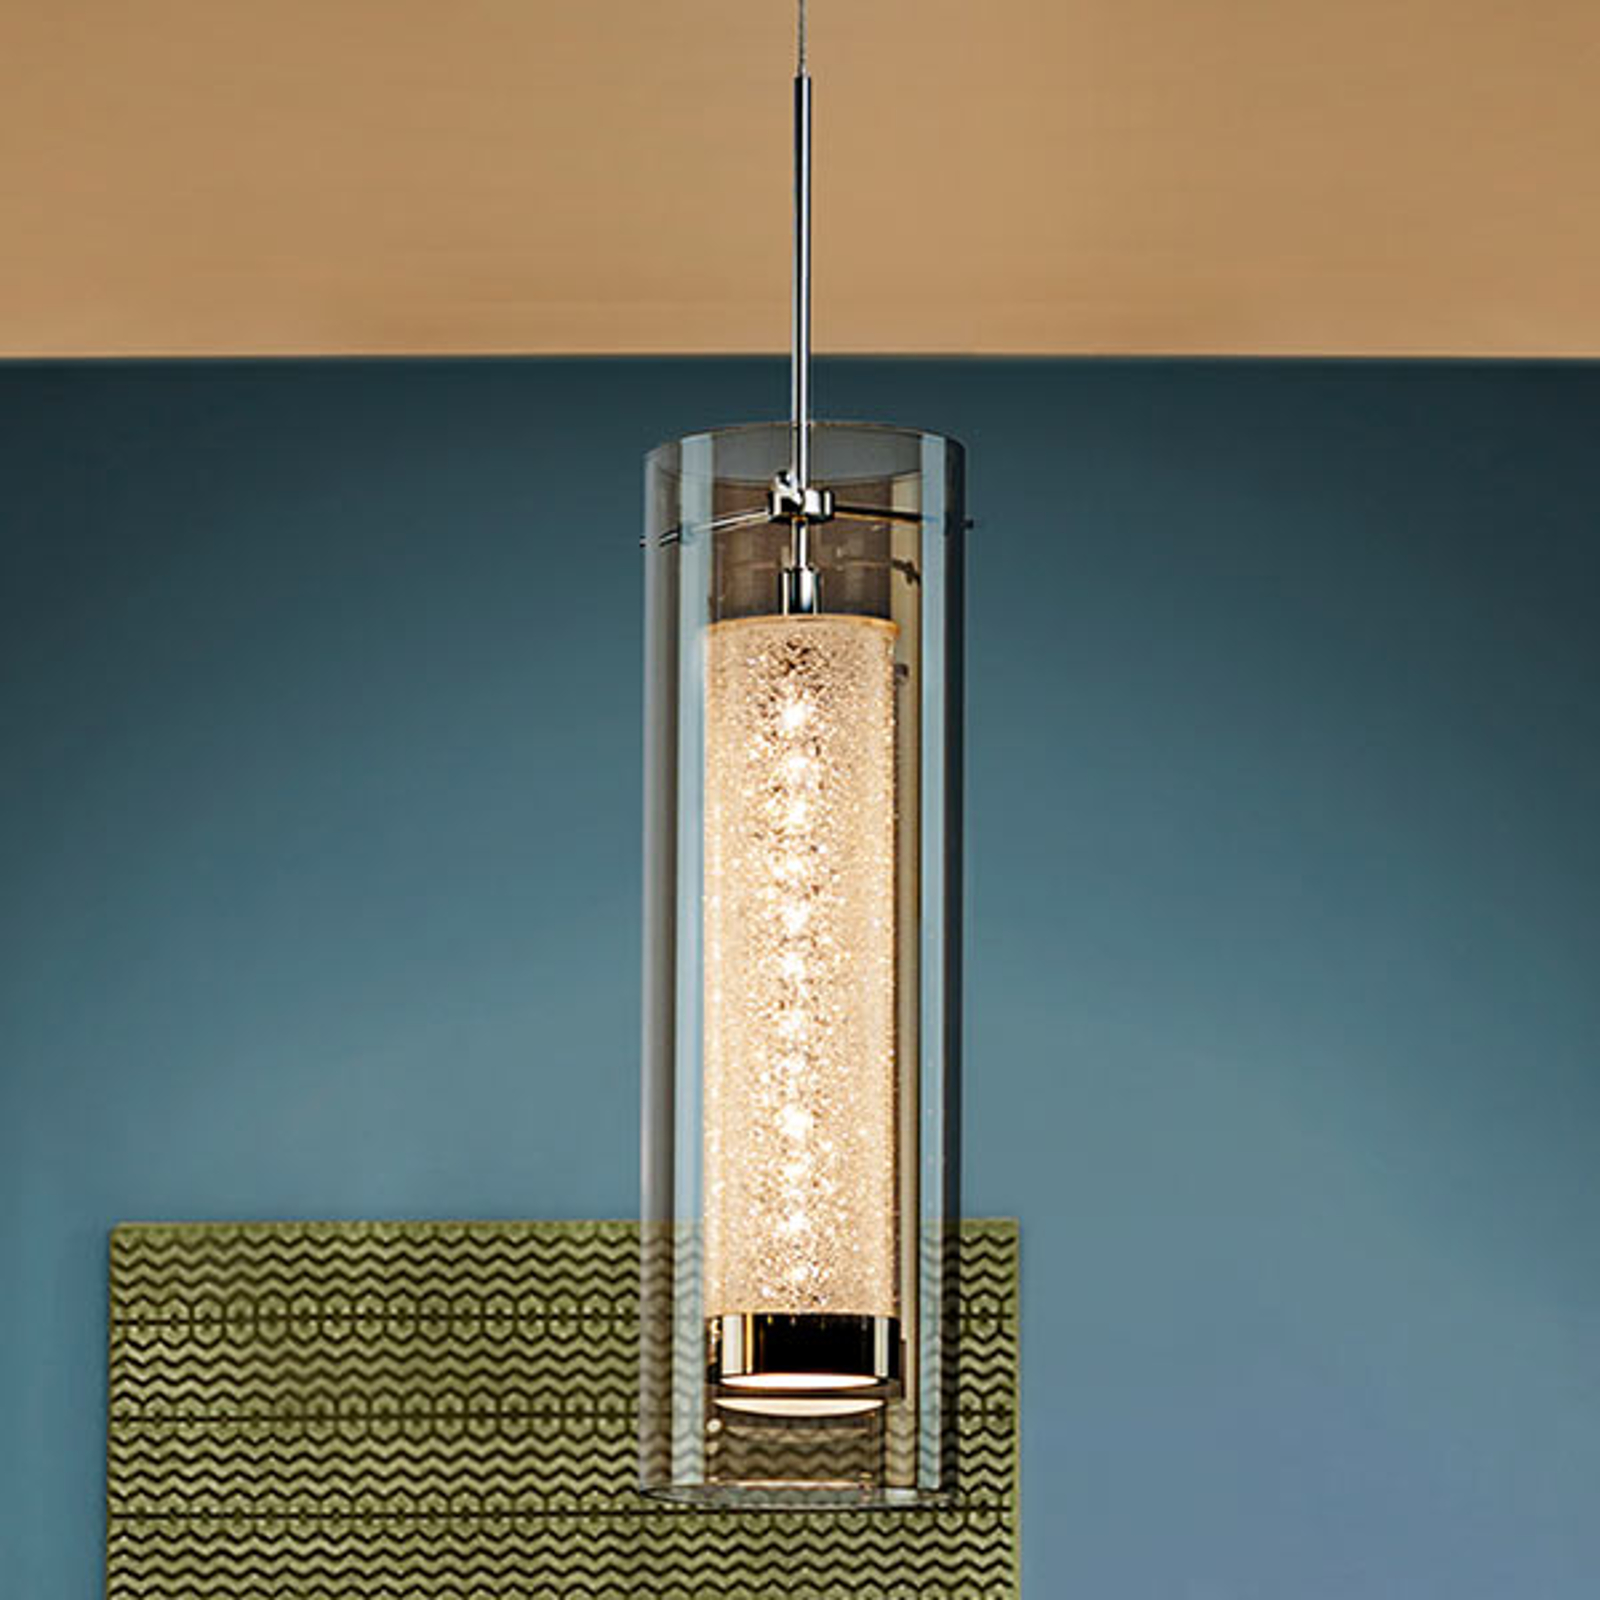 Zila - LED-riippuvalaisin, kaksoisvarjostin